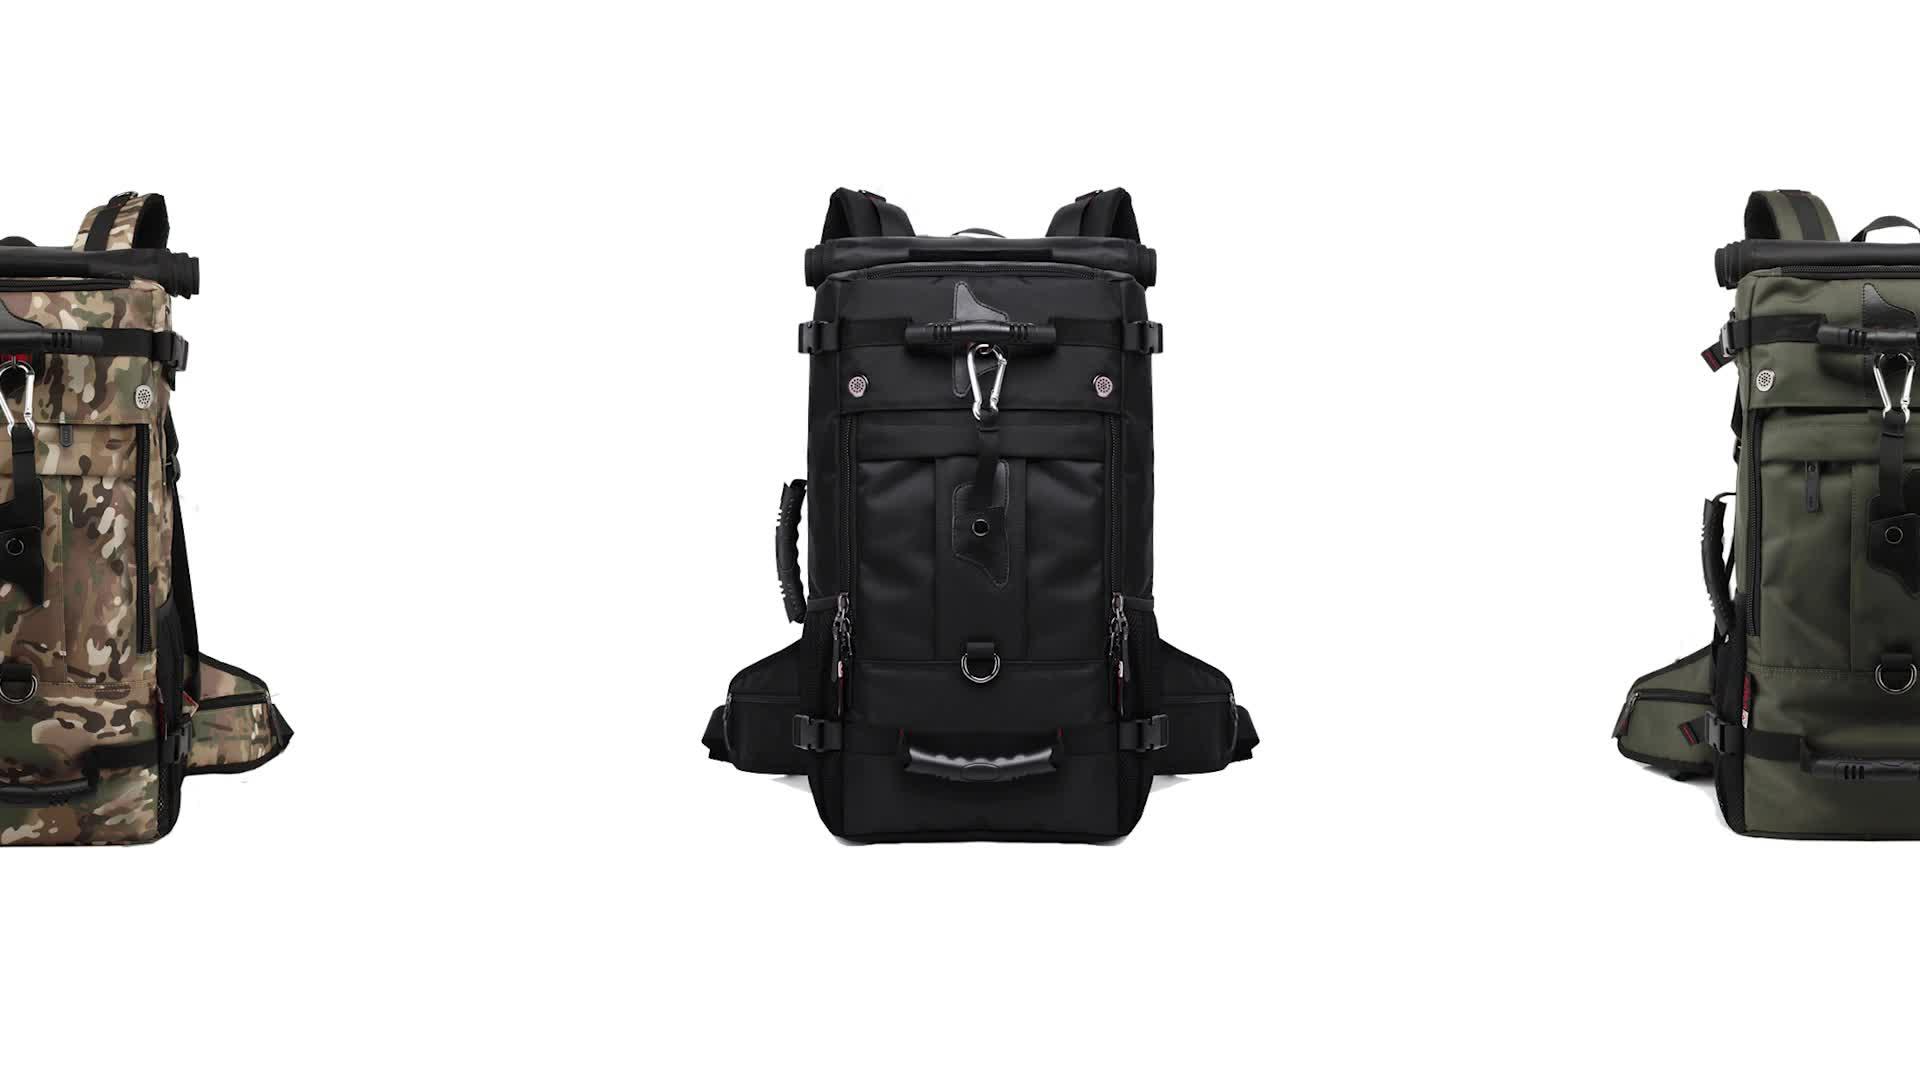 free lock guangzhou kaka 40l 3 way mens custom waterproof backpack bag travelling backpack for men